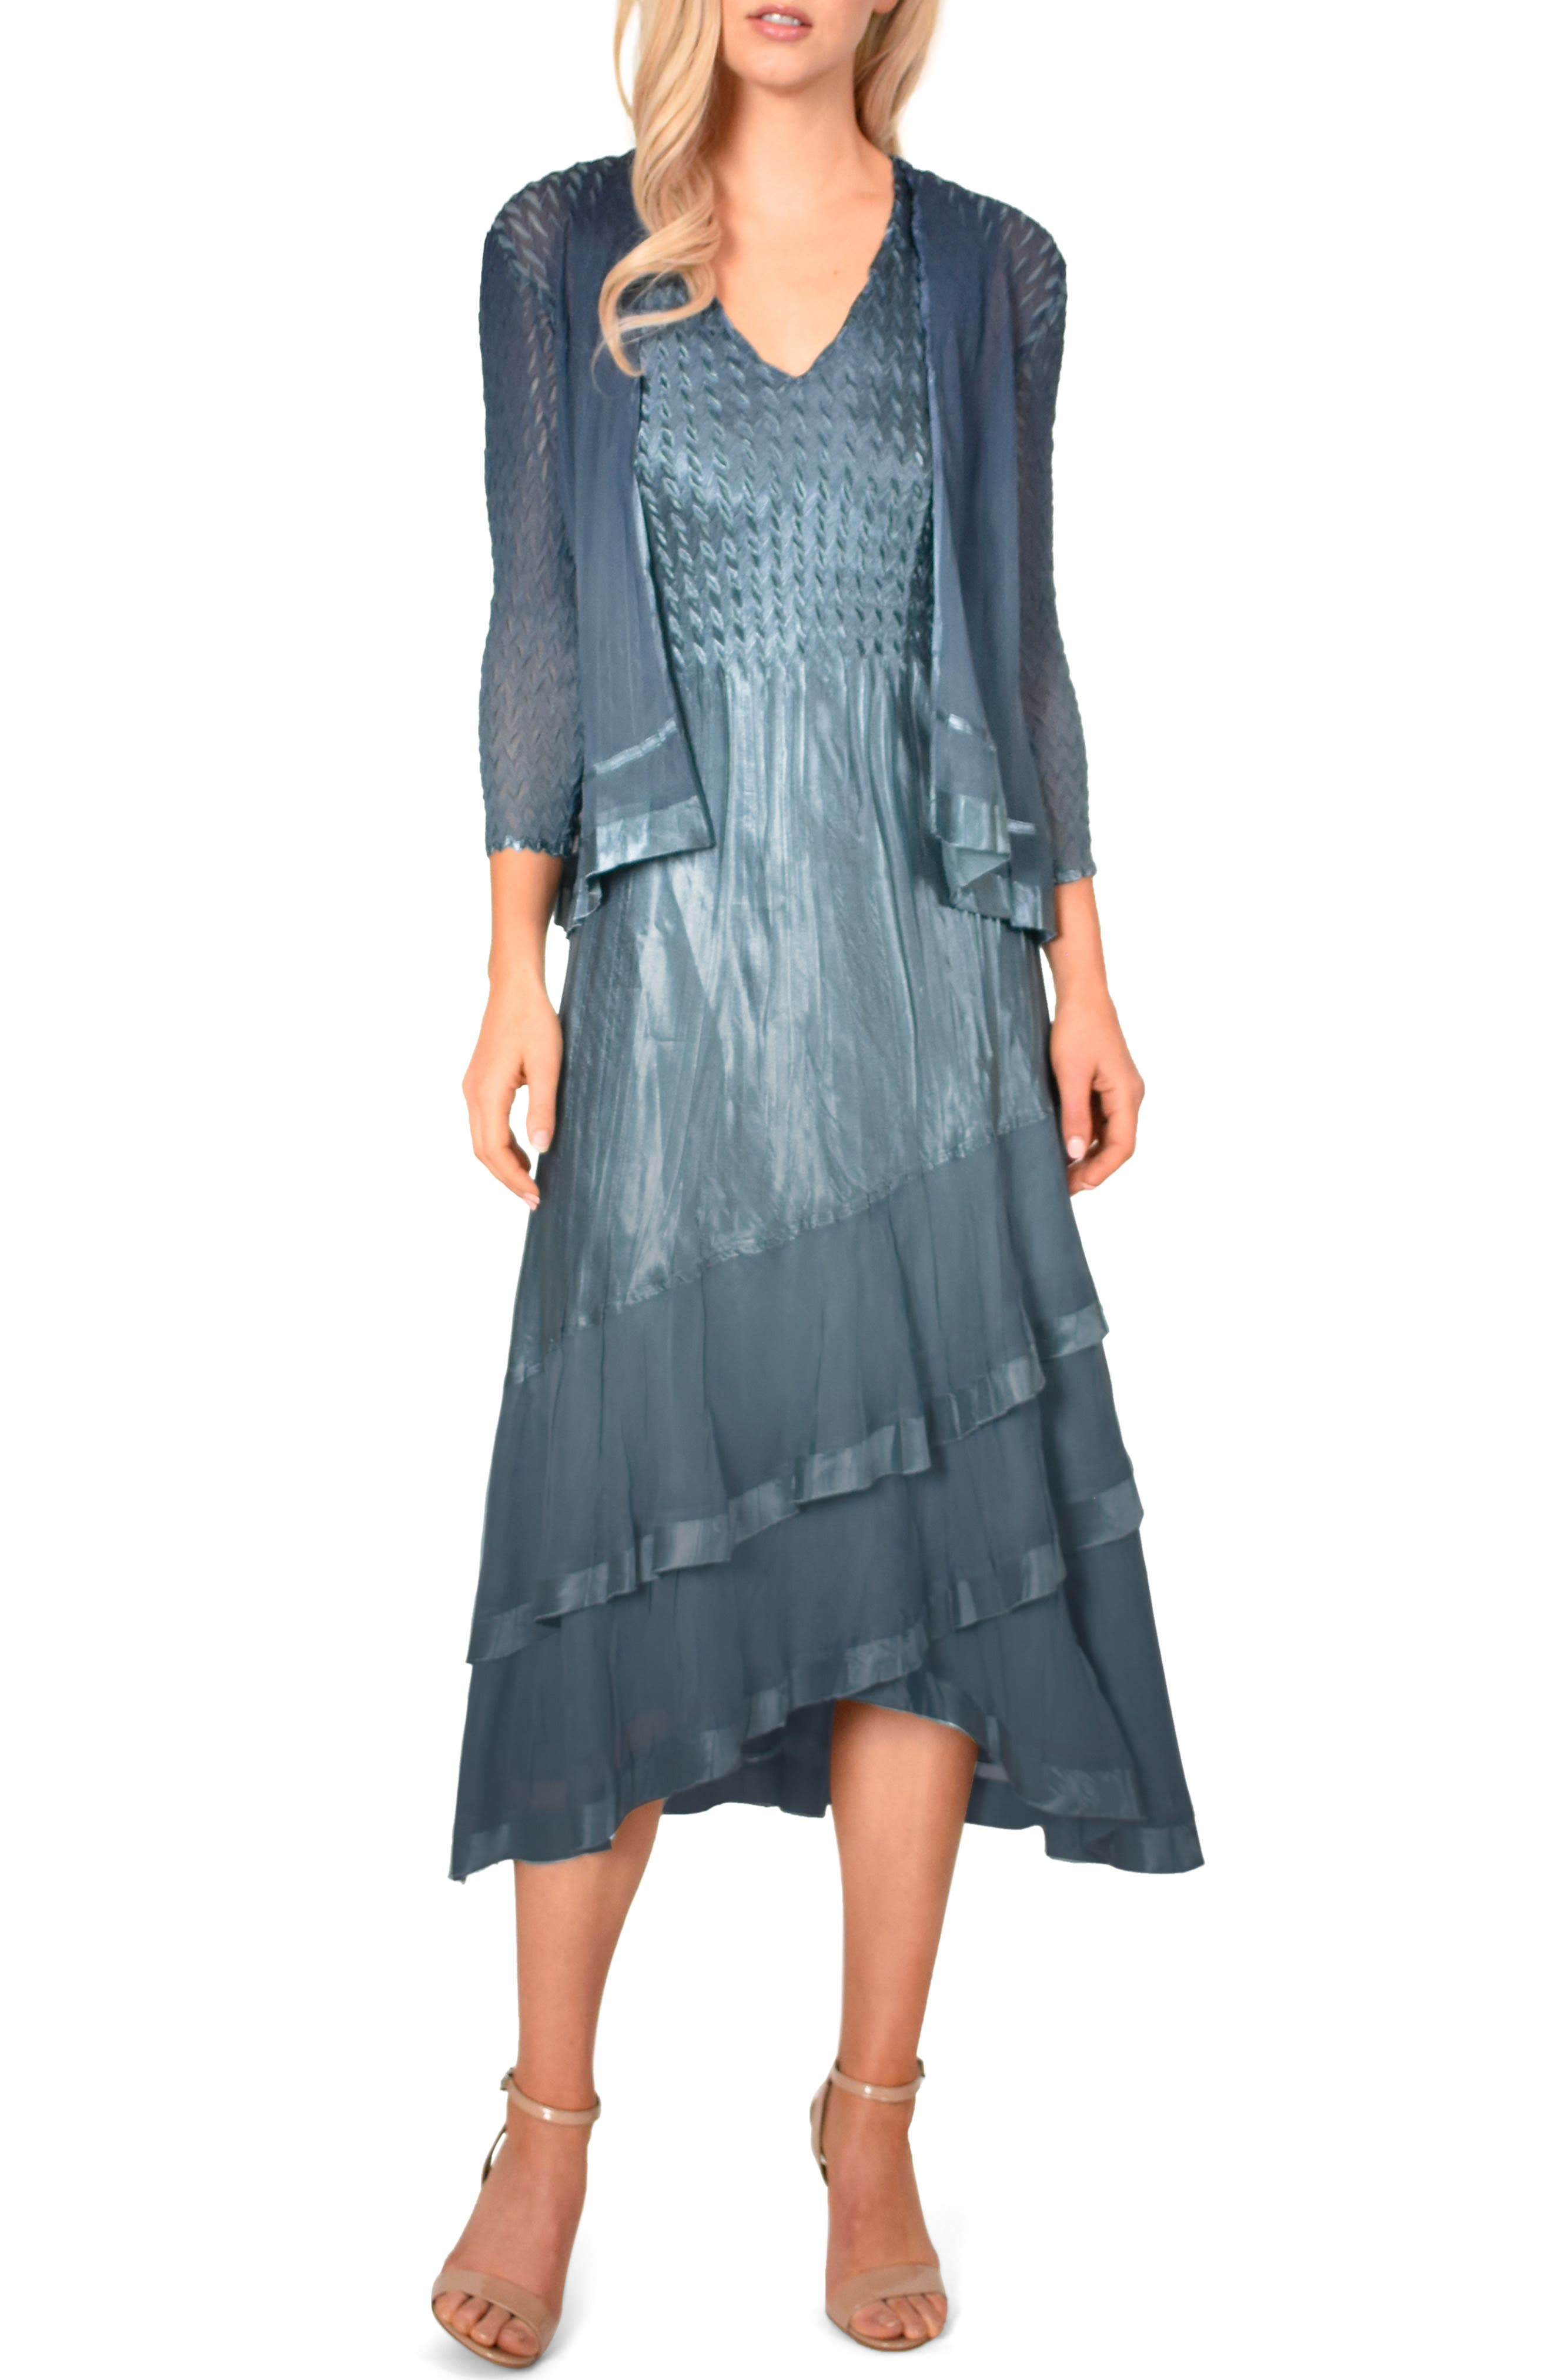 KOMAROV, Asymmetrical Jacket Dress, Main thumbnail 1, color, SILVER BLUE NIGHT OMBRE